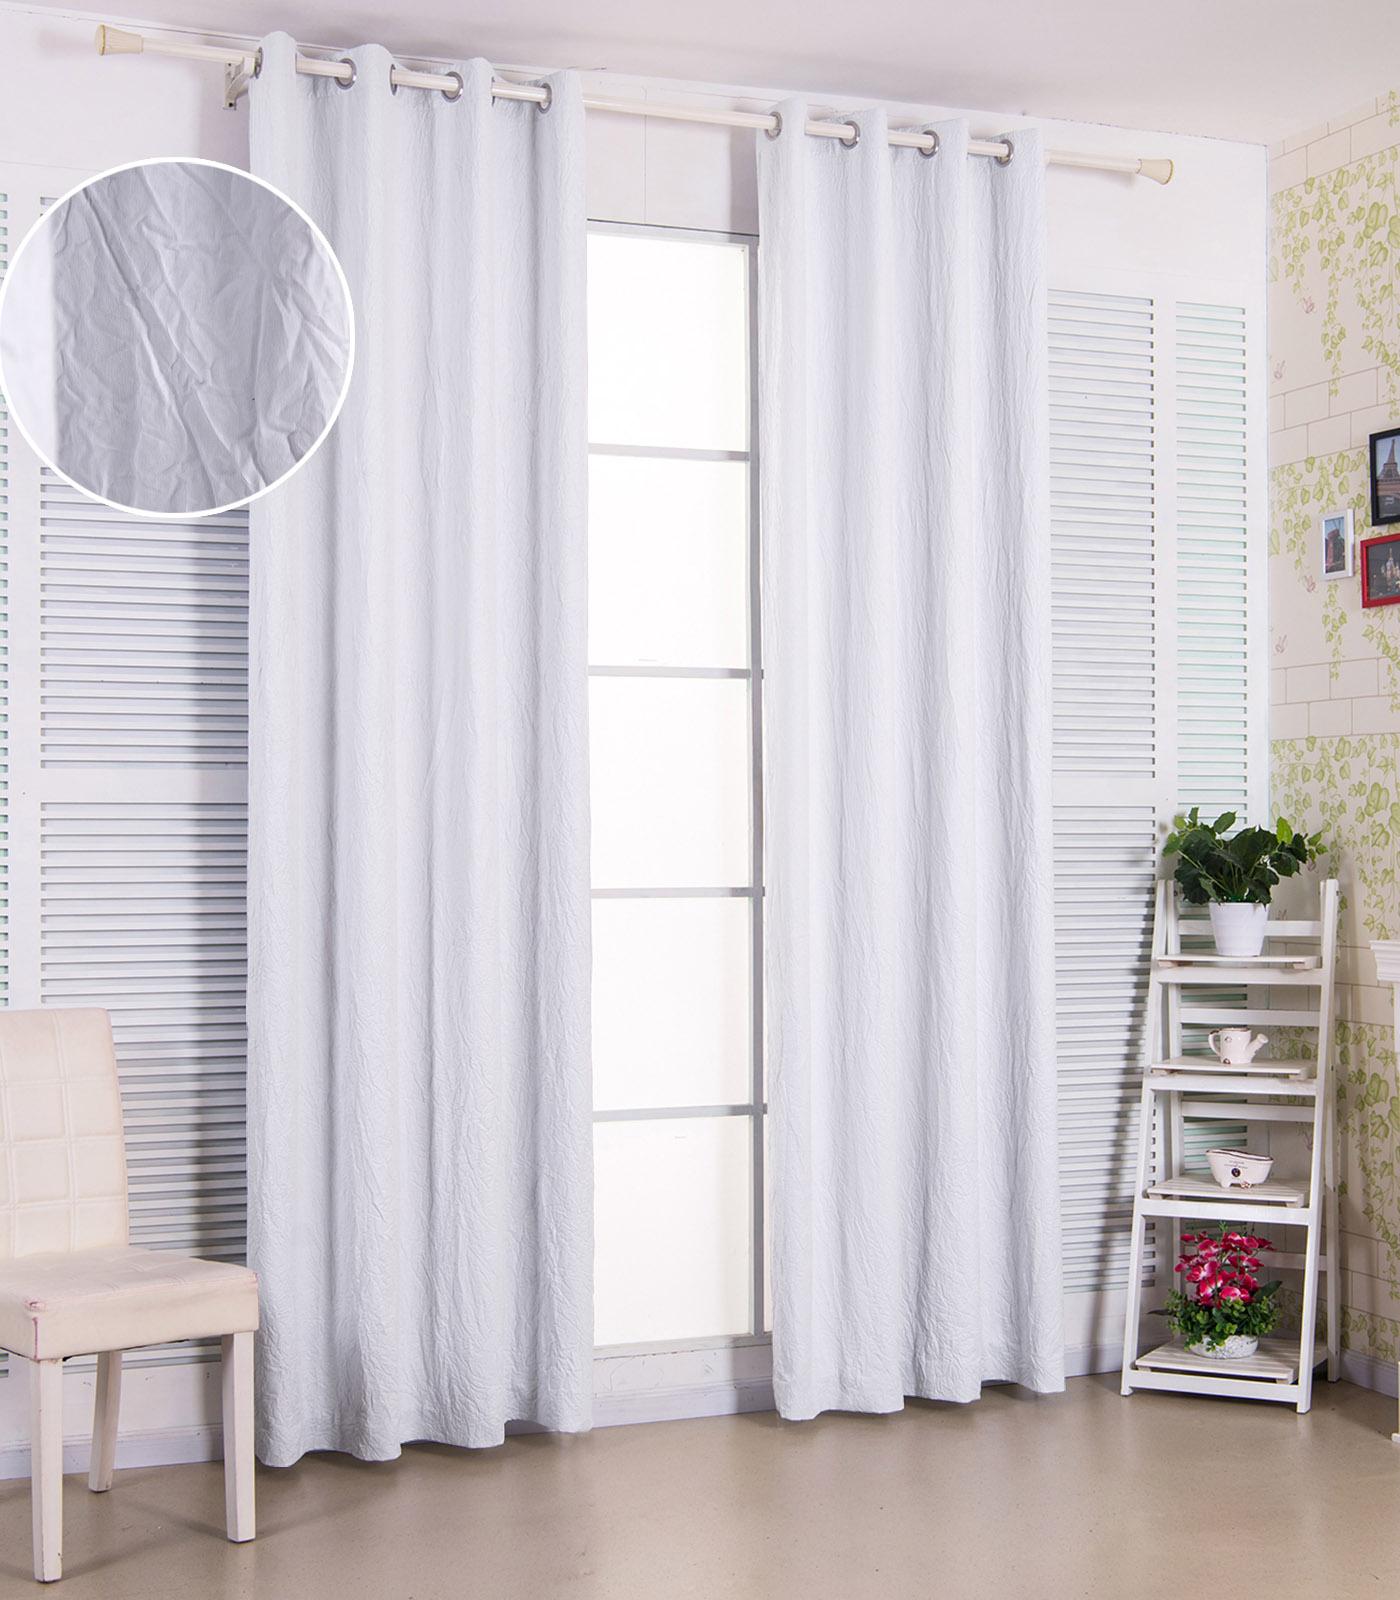 2x gardinen vorh nge blickdicht sen verdunkelung 135x225cm wei crush vh5851ws2 ebay. Black Bedroom Furniture Sets. Home Design Ideas